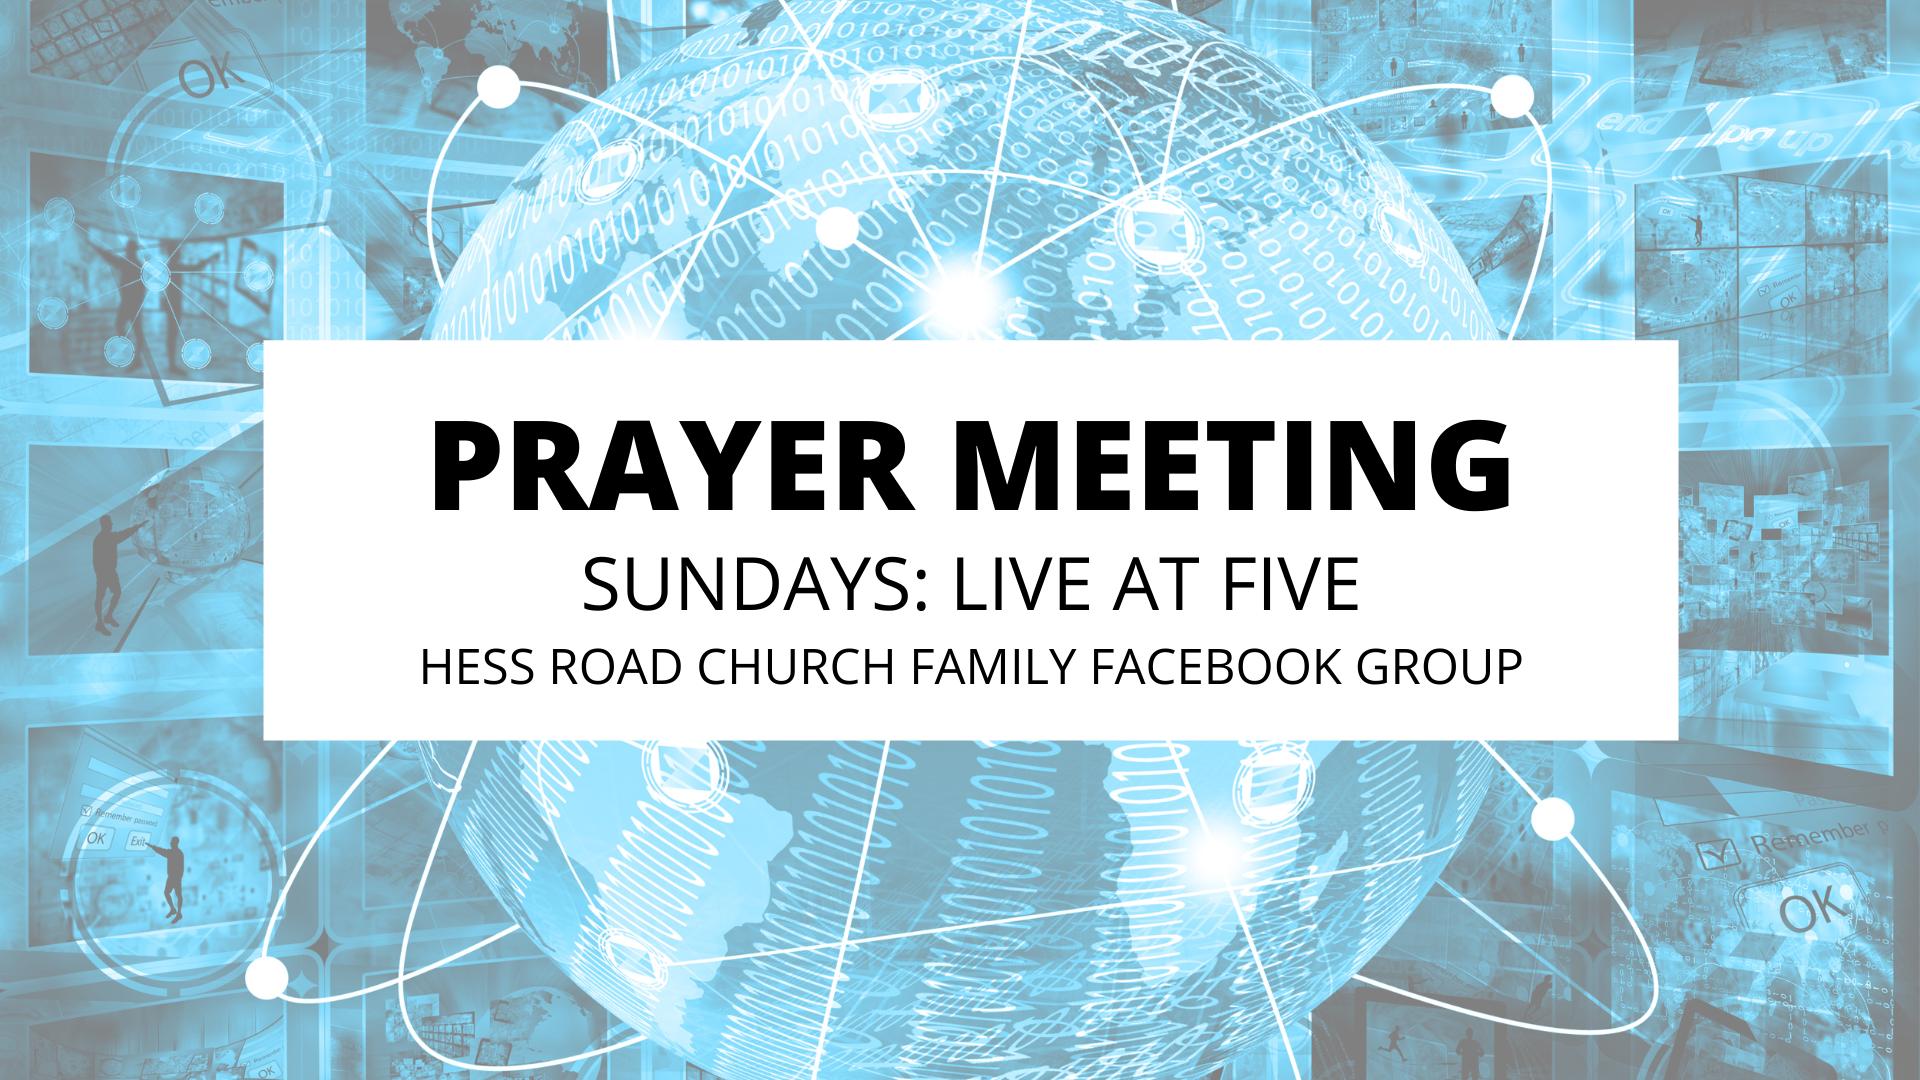 PRAYER MEETING (1)